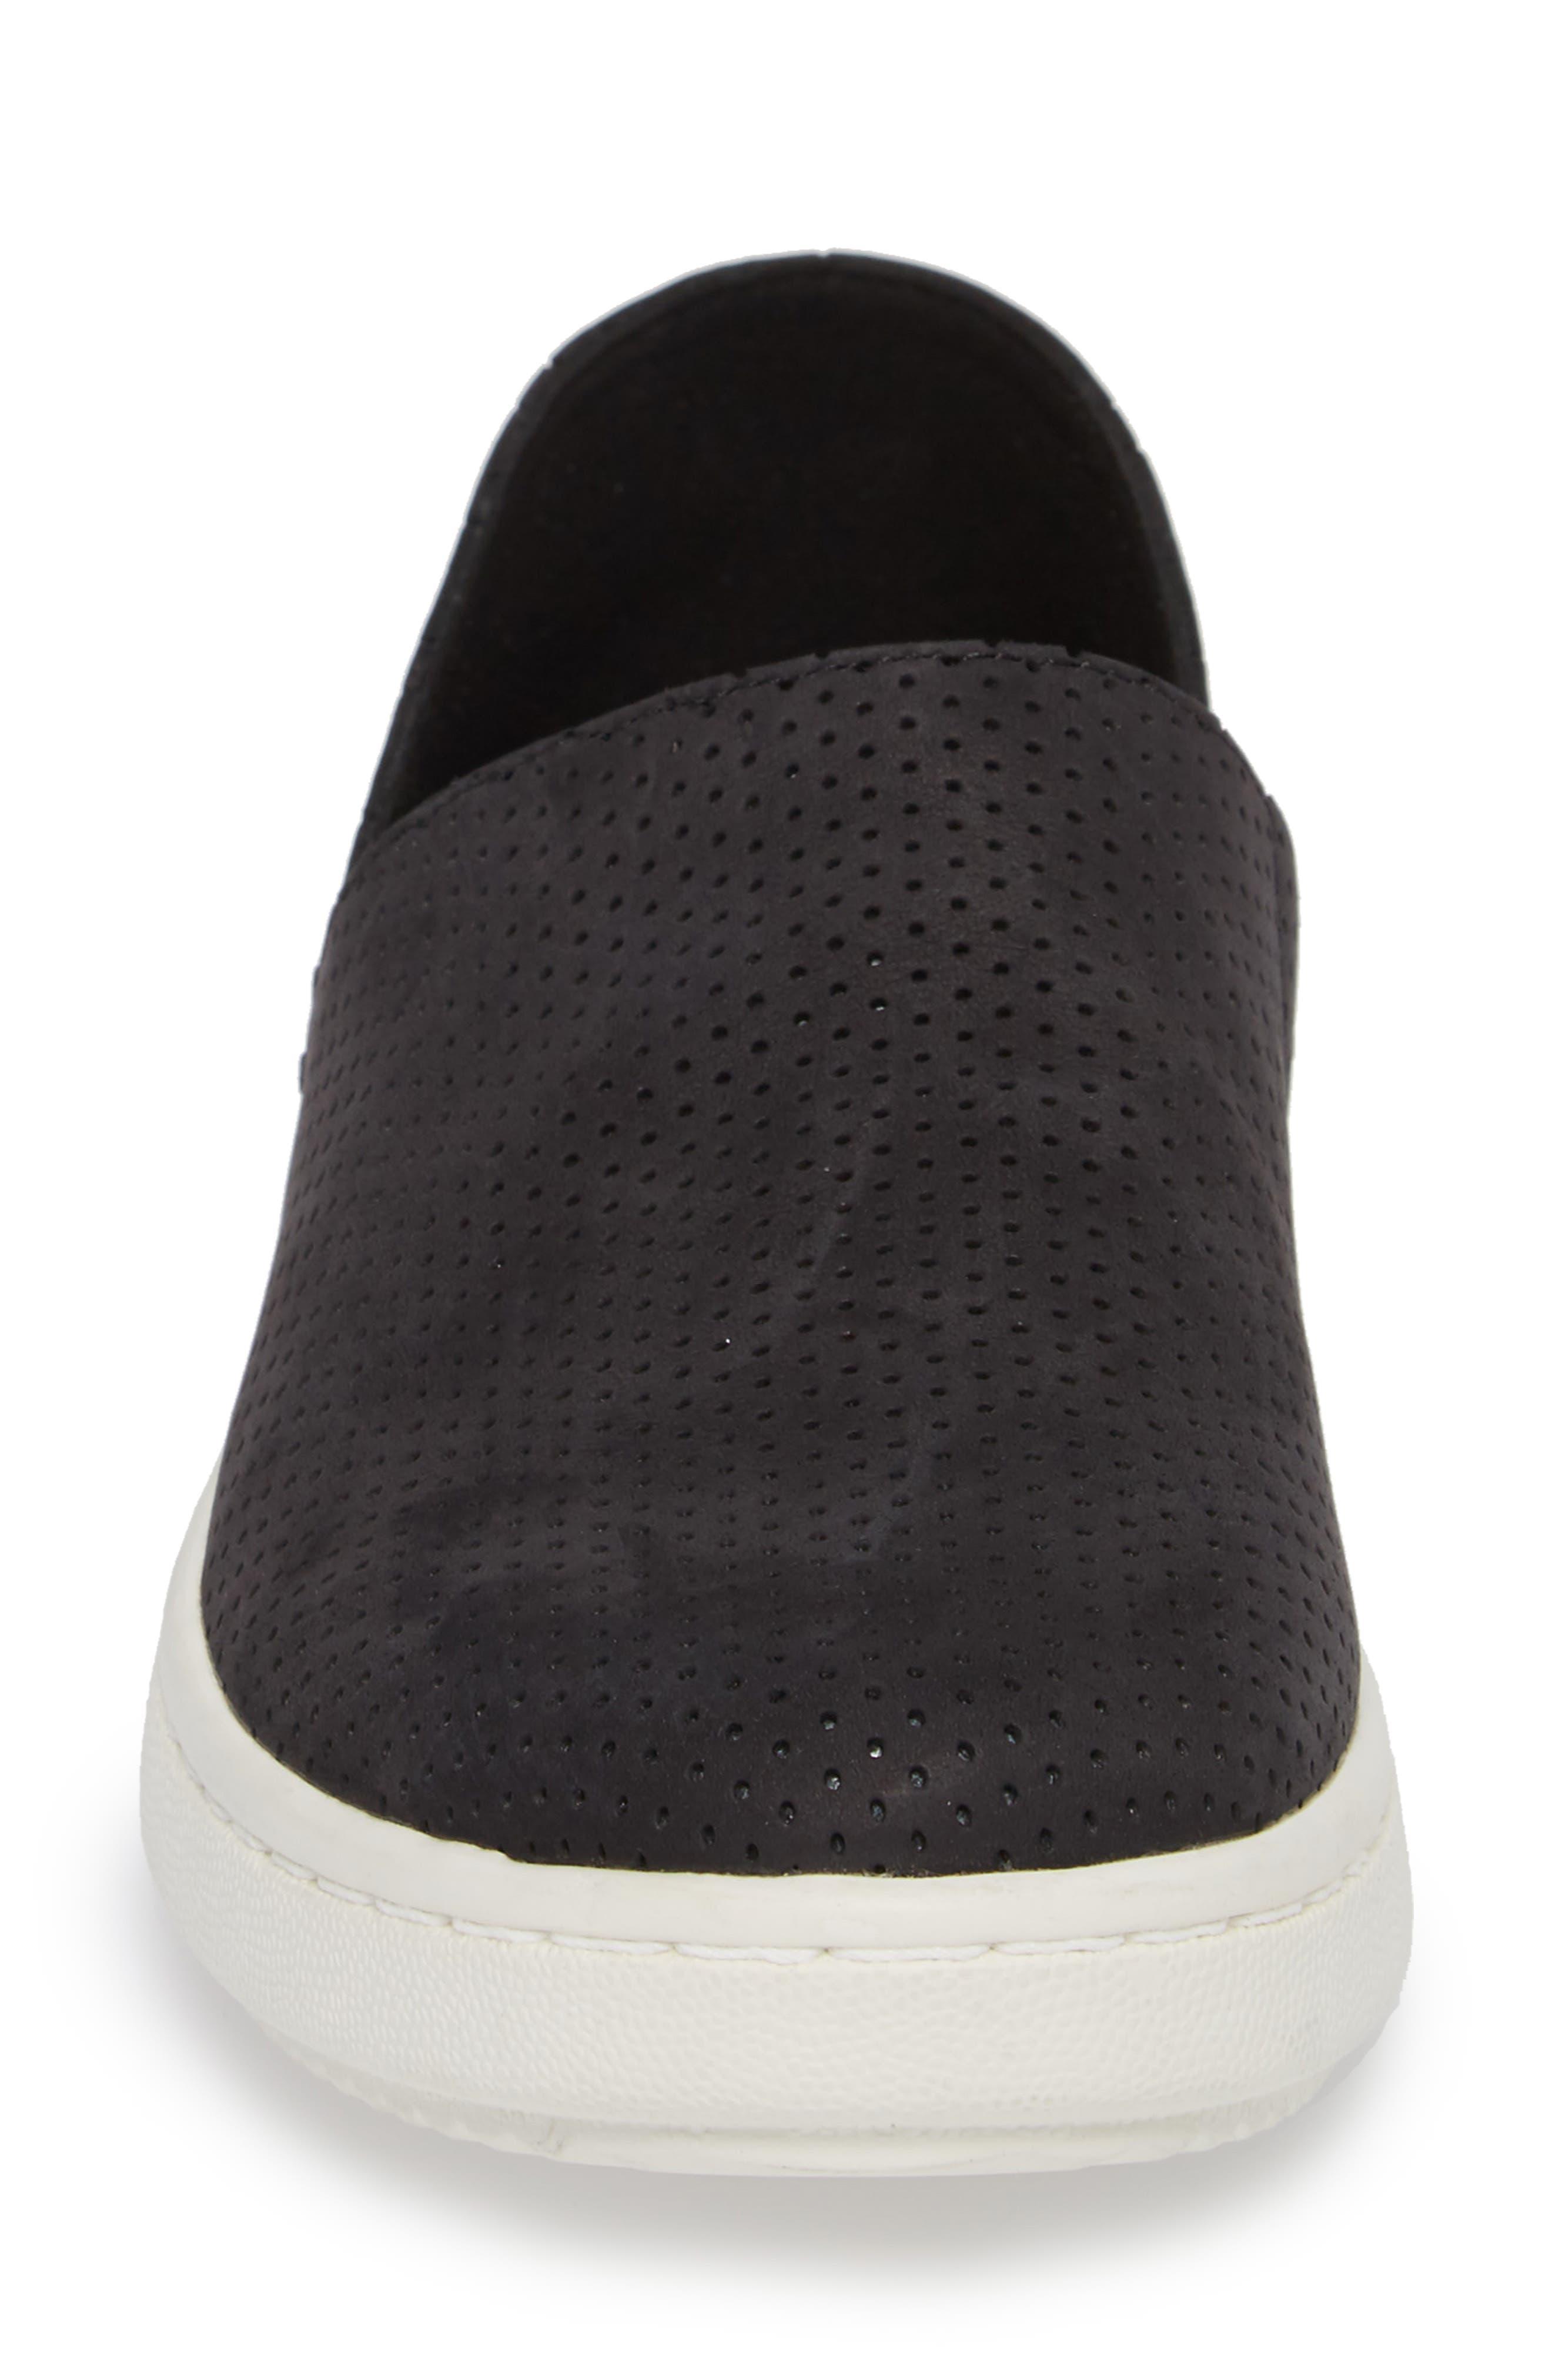 Panda Perforated Slip-On Sneaker,                             Alternate thumbnail 4, color,                             001